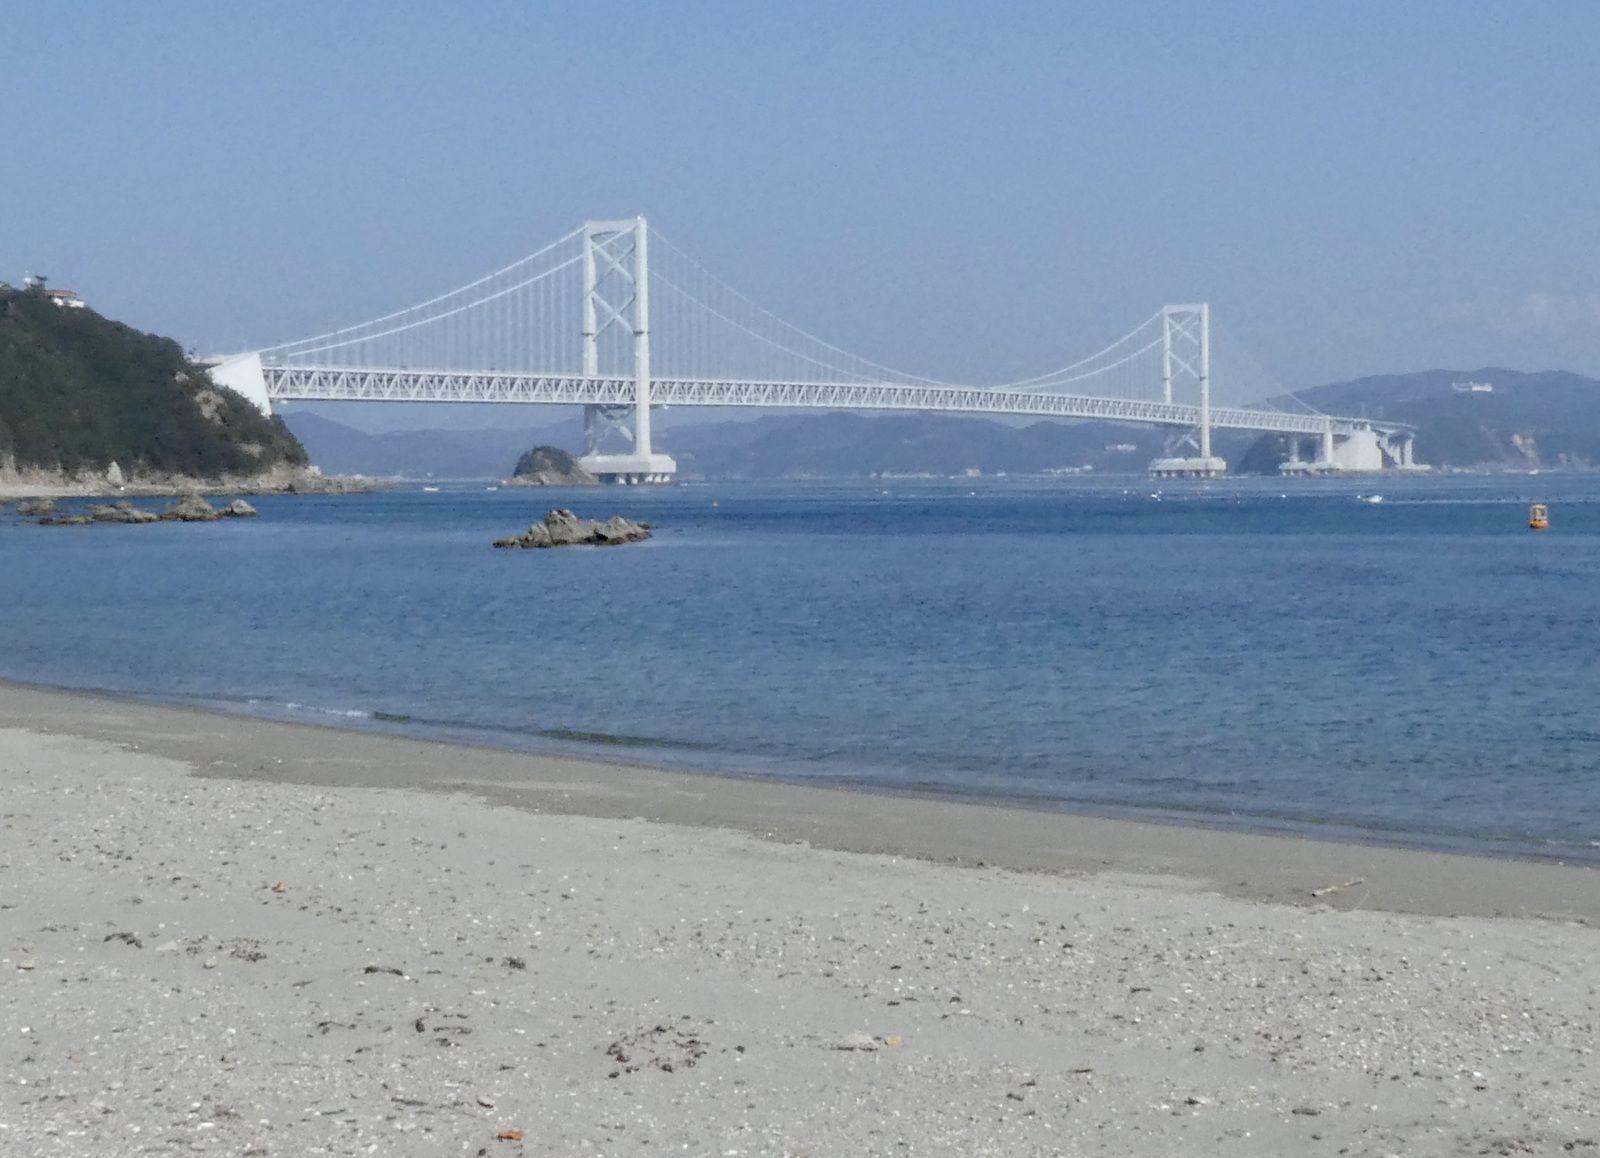 Le pont suspendu de Naruto, depuis Shikoku